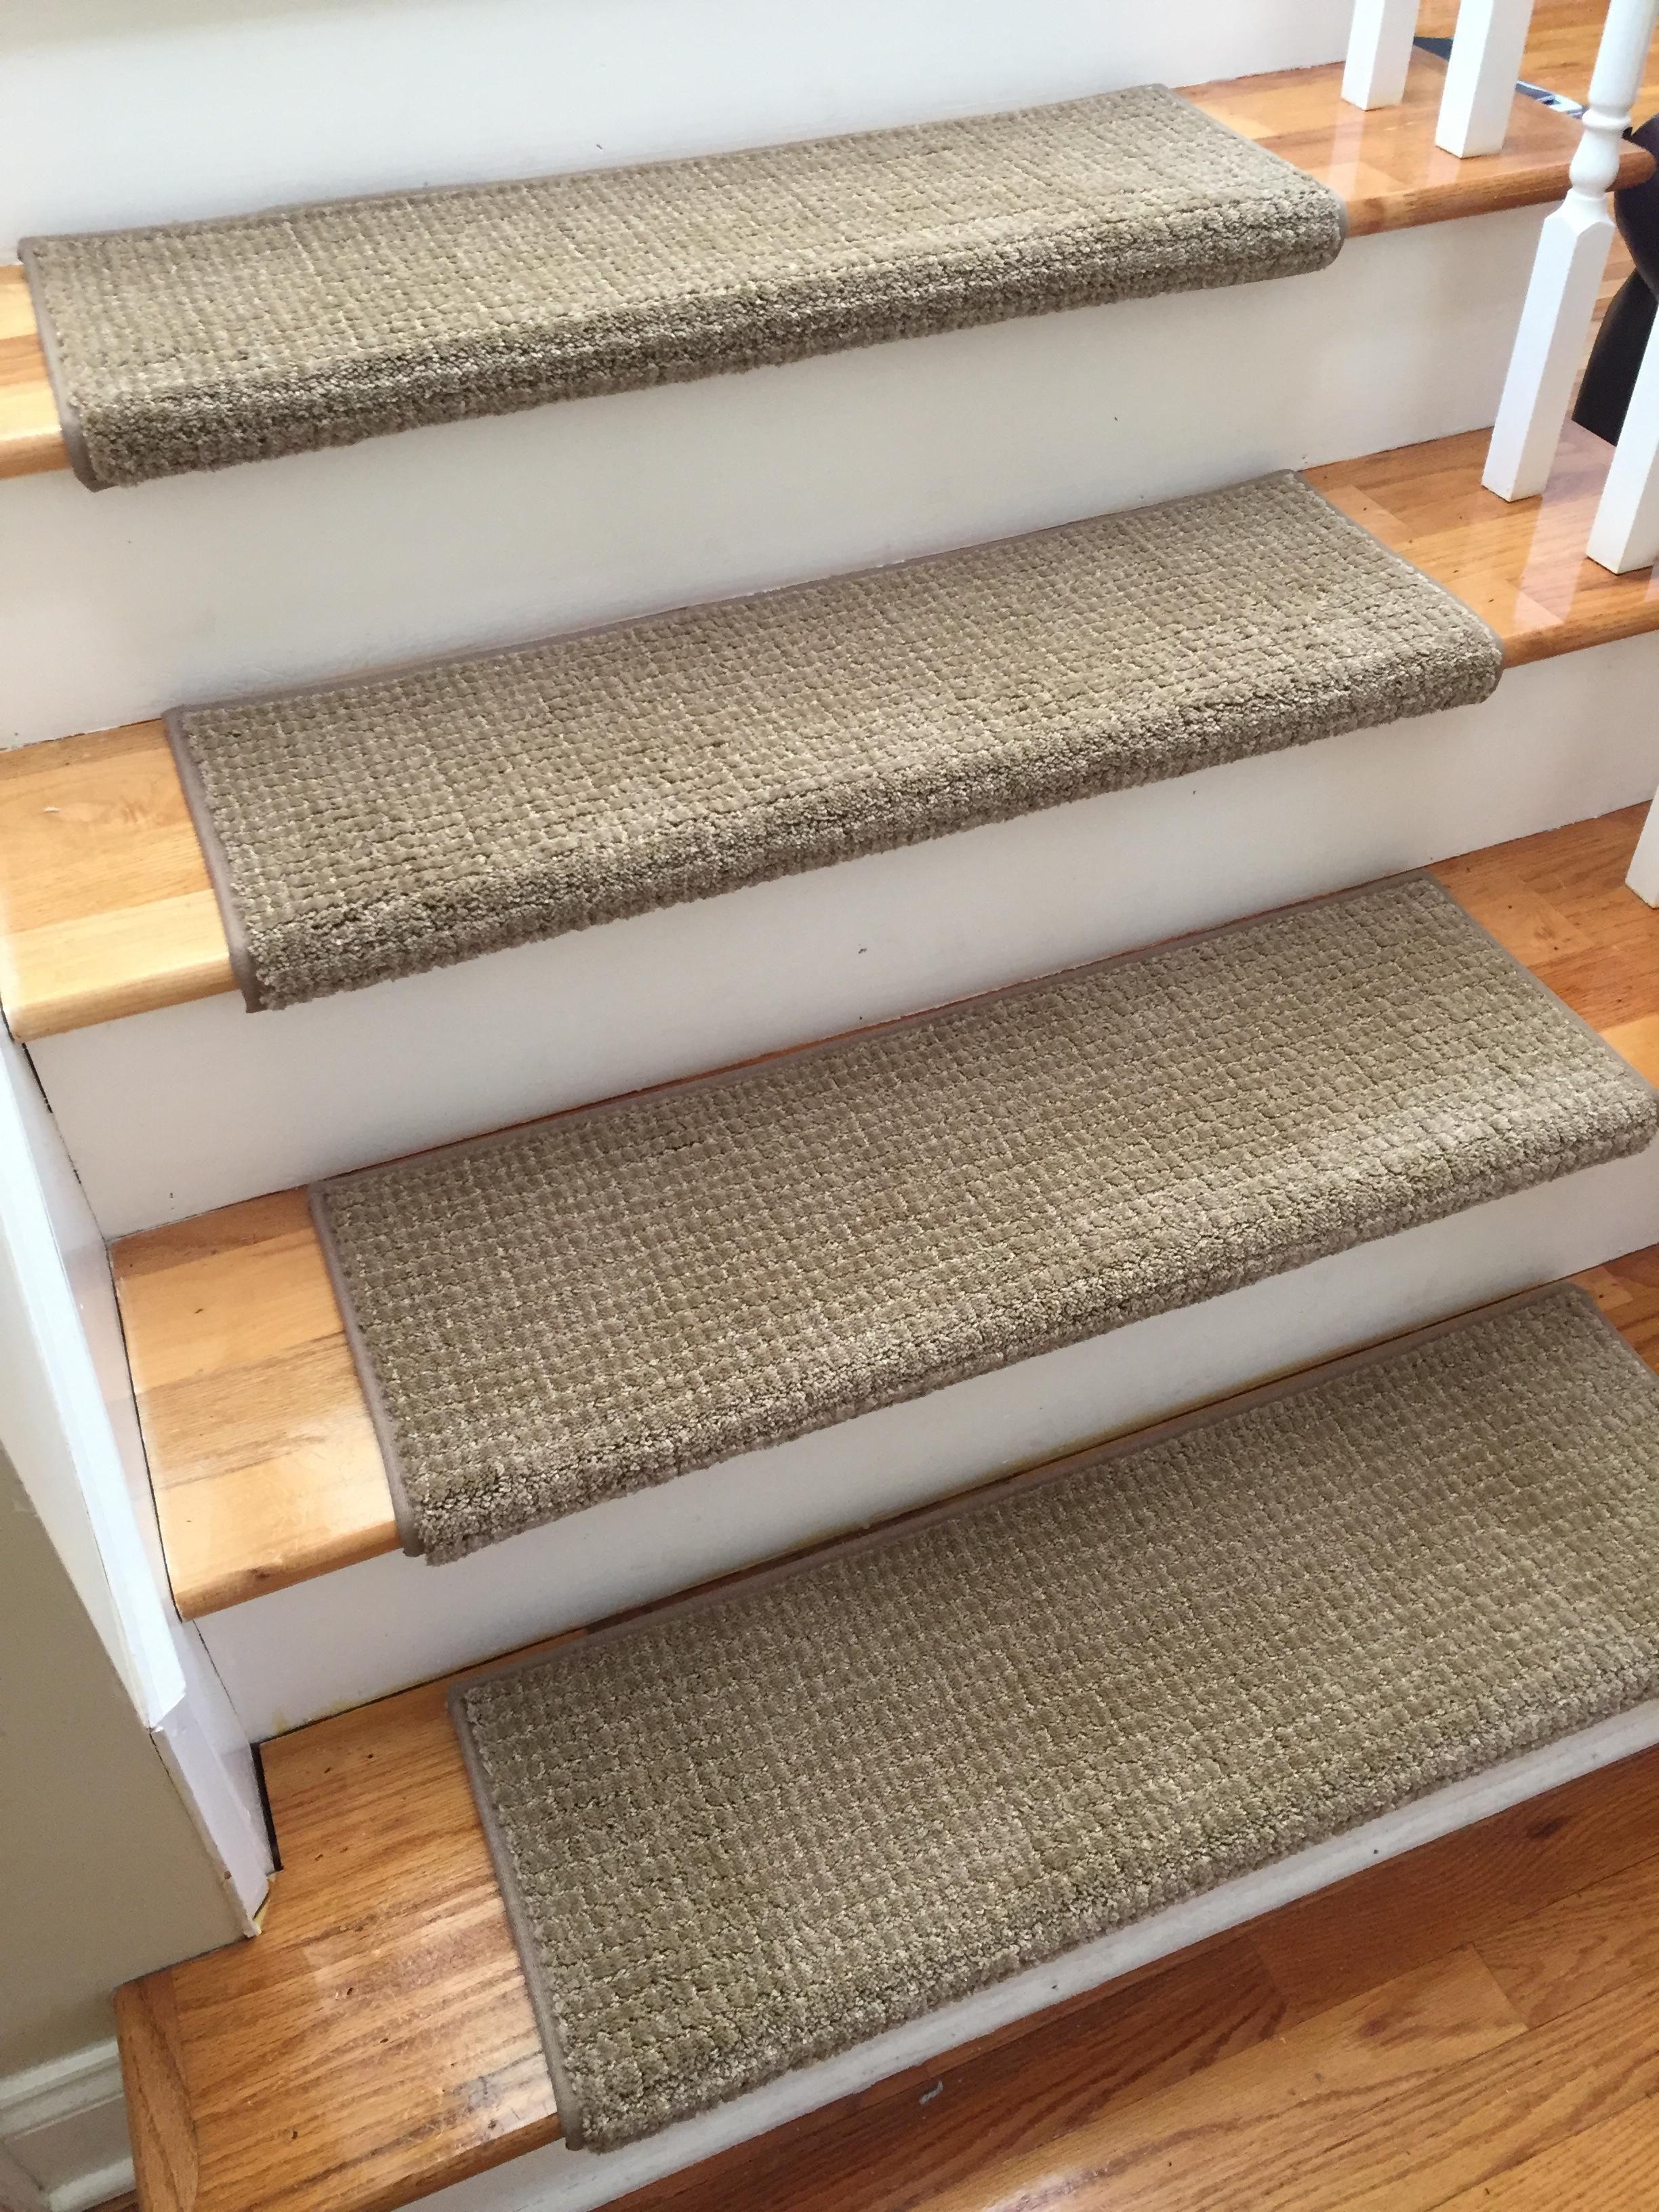 Best Chaps True Bullnose Carpet Stair Treads Chaps Treads Home Of The True Bullnose™ Tread Part 400 x 300